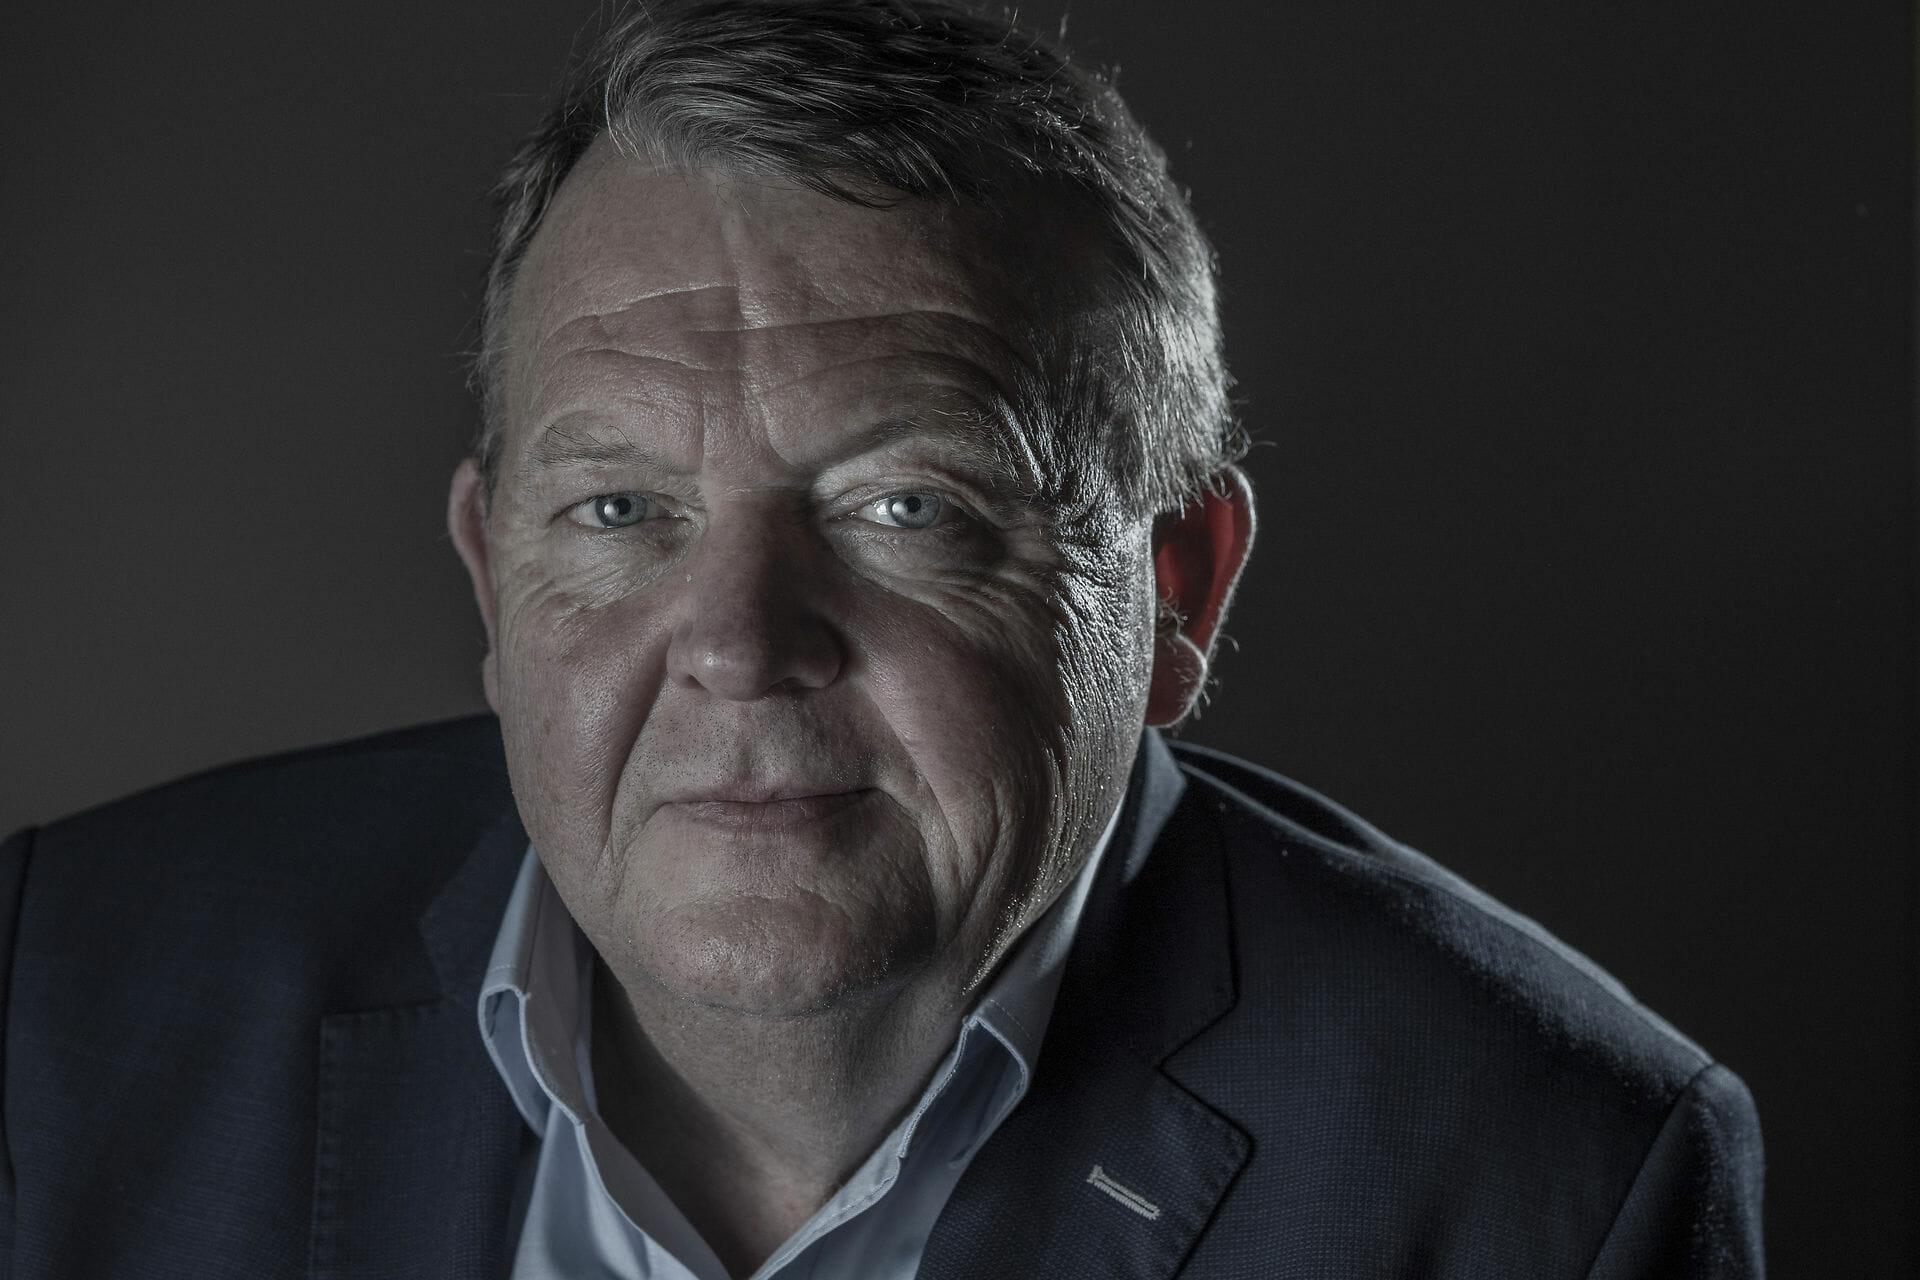 Lars Løkke Rasmussen stifter nyt parti på midten i dansk politik